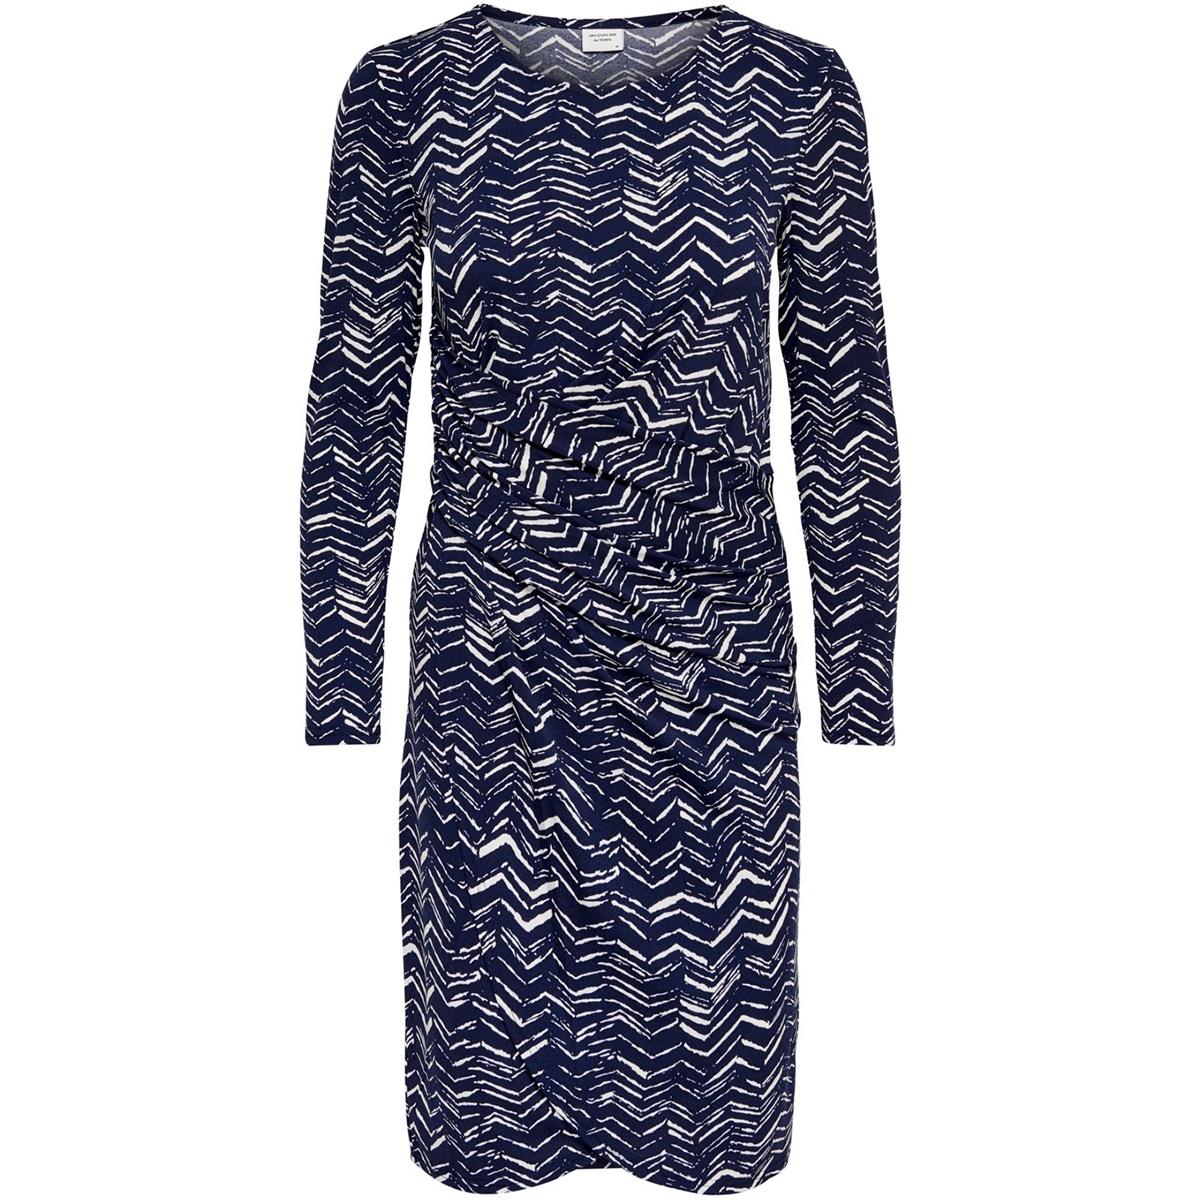 jdyheart l/s dress jrs 15184764 jacqueline de yong jurk peacoat/peacoat